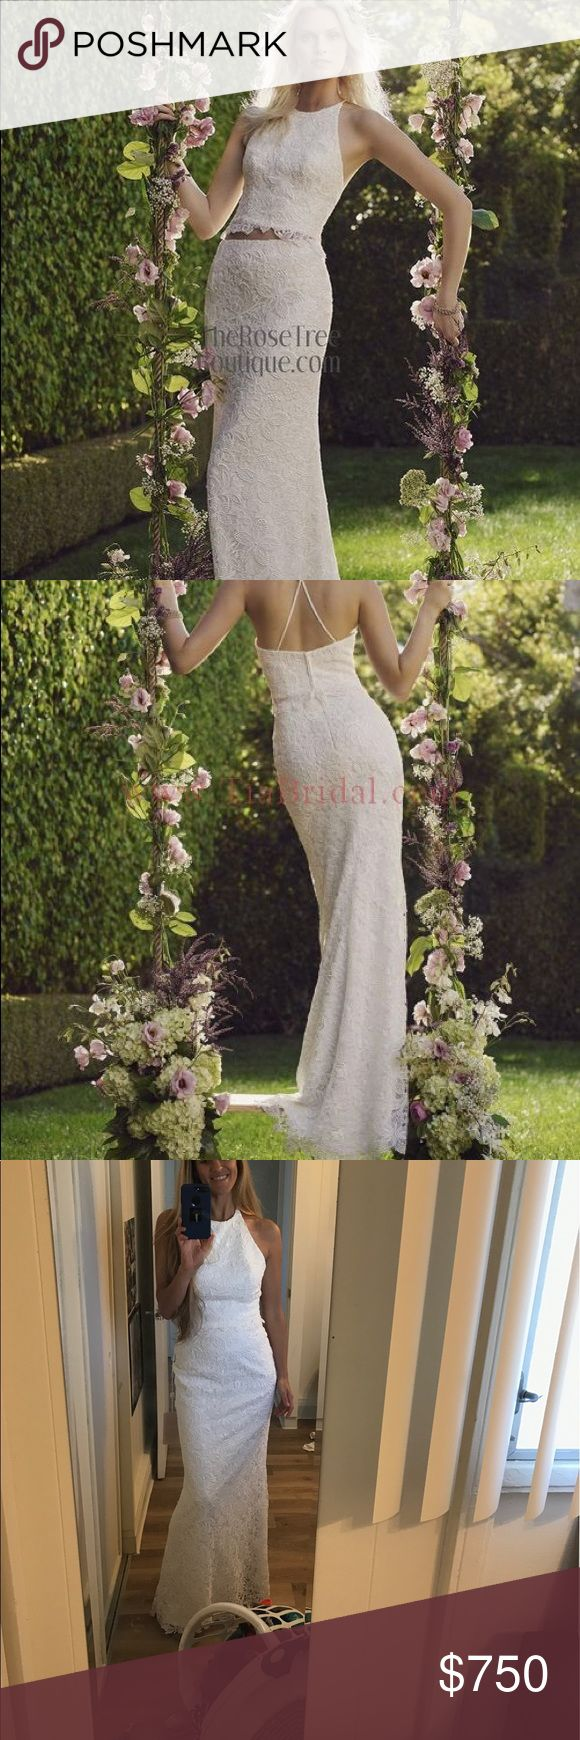 casablanca dress wedding dress garment bag Casablanca two piece wedding dress New with tags This is aGORGEOUS two piece wedding dress